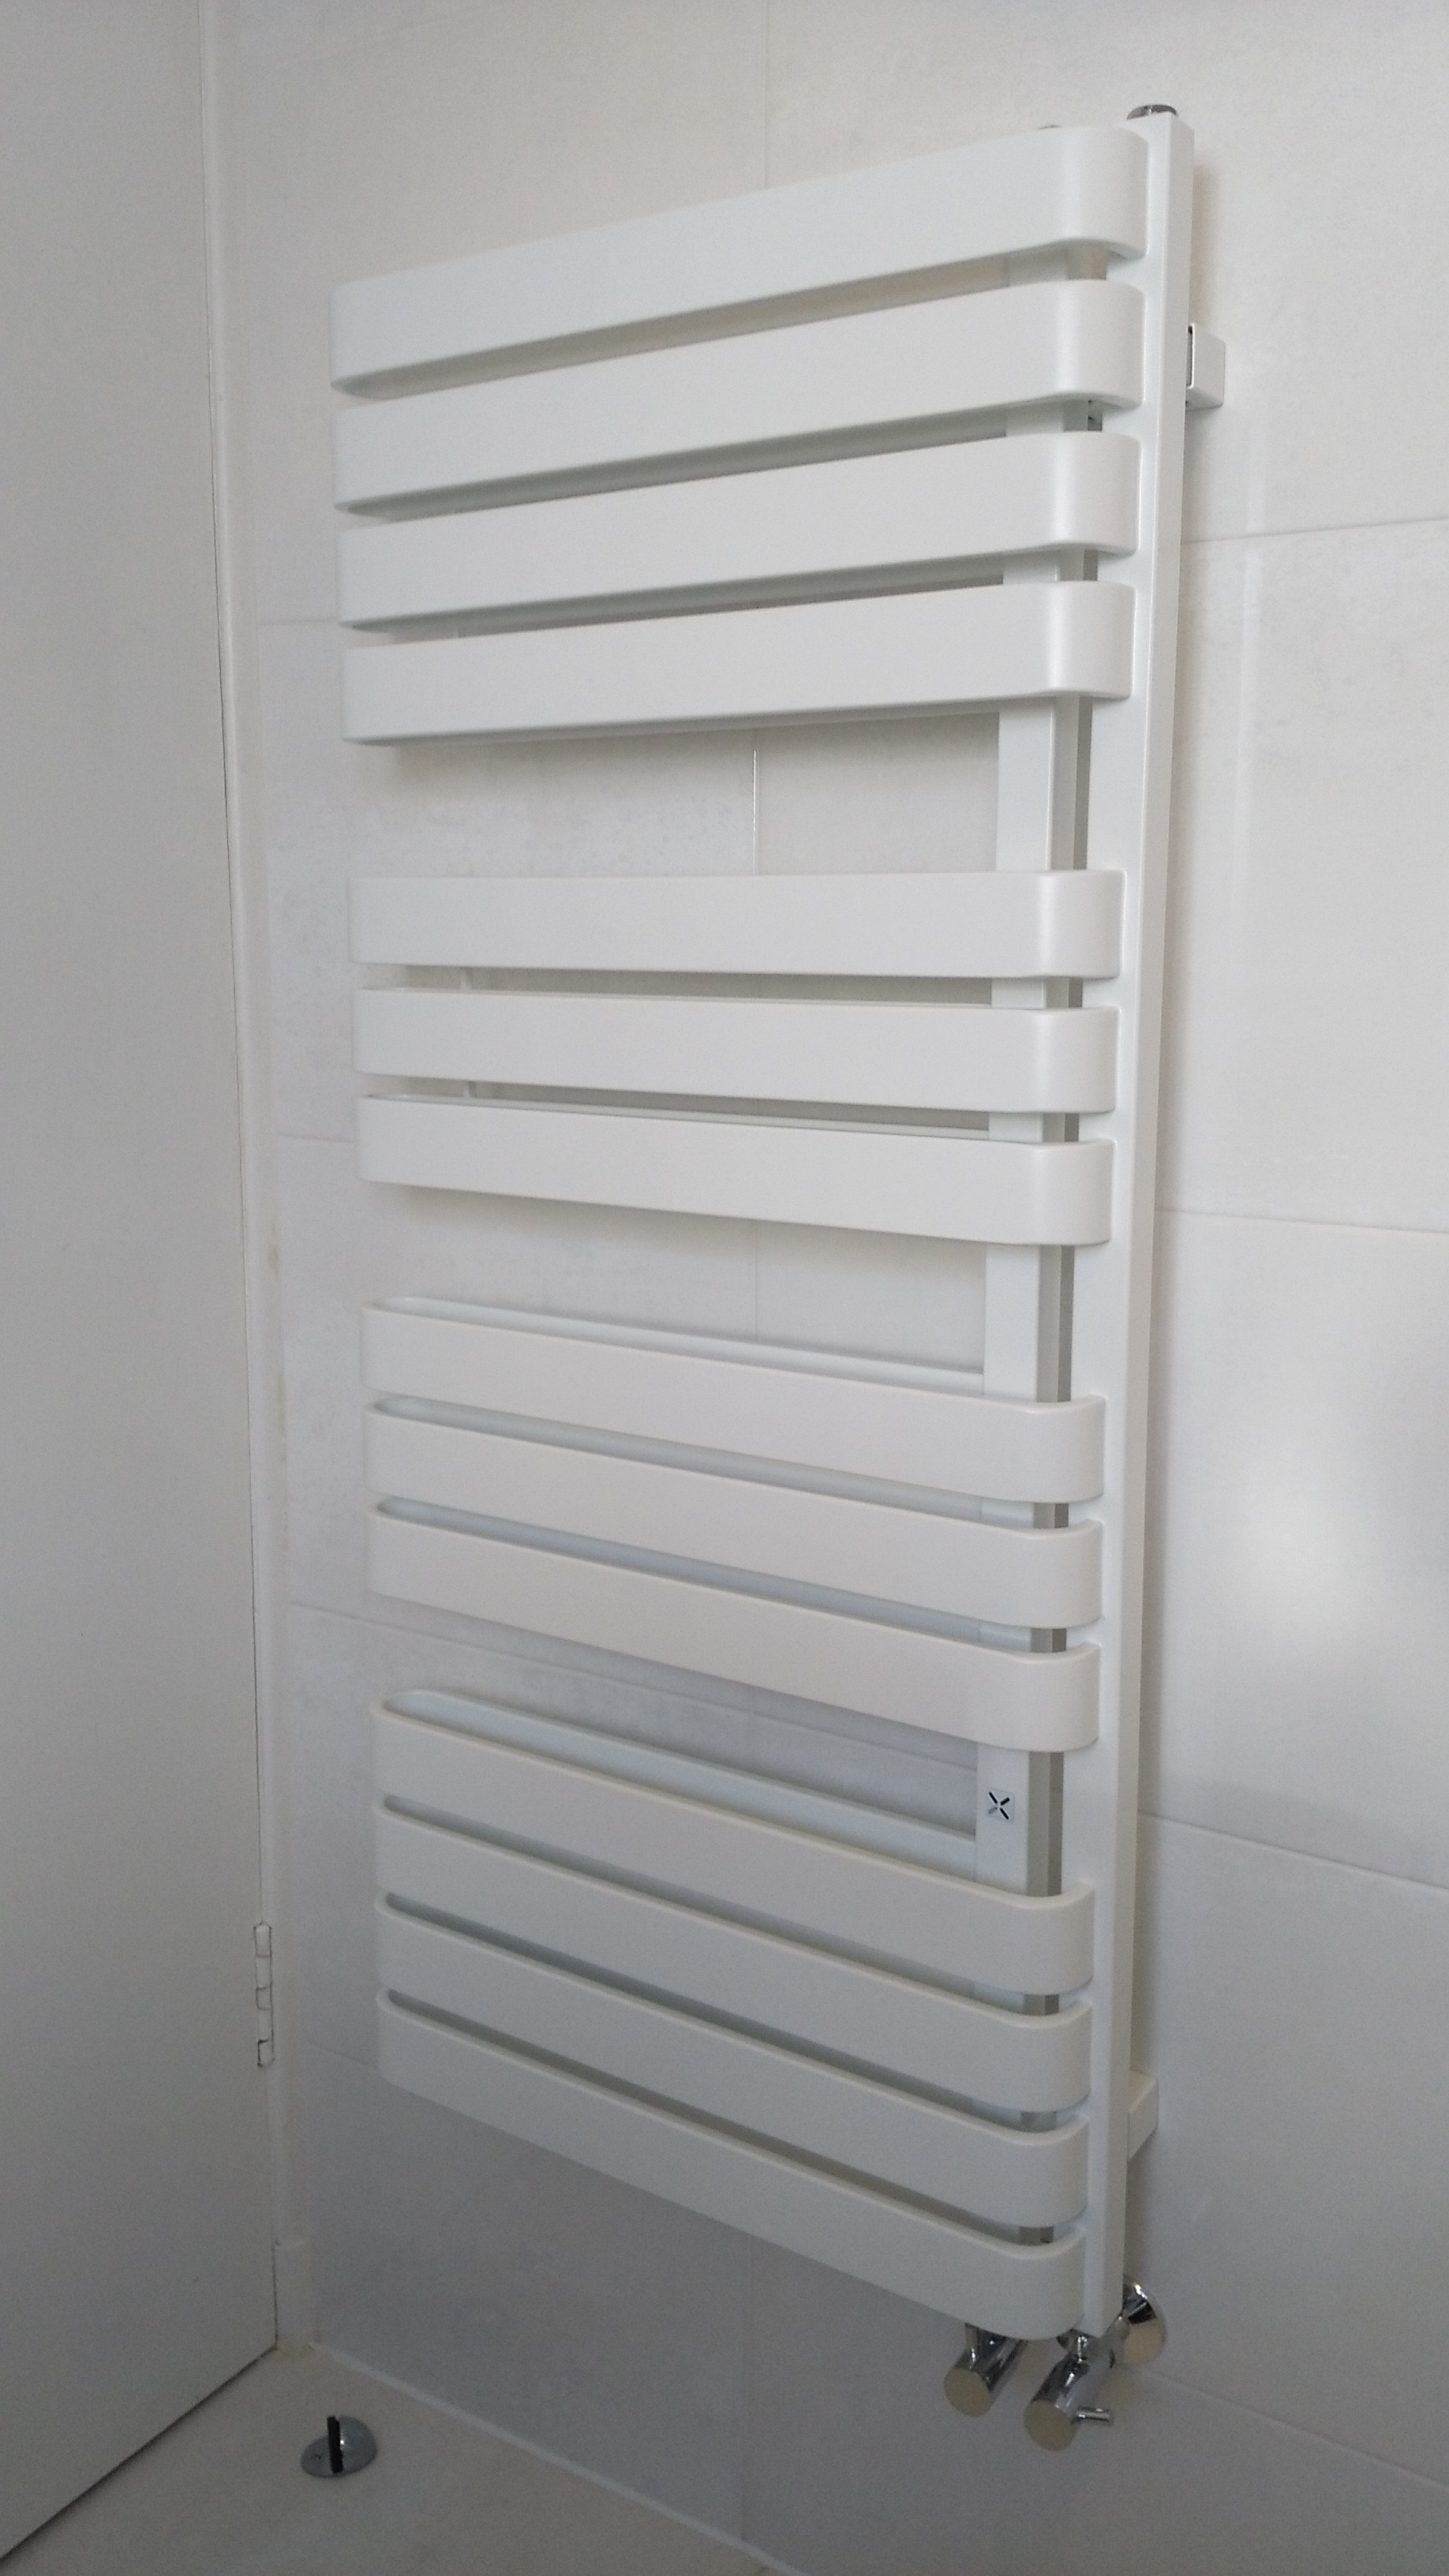 White radiator for towels in bathroom Edinburgh